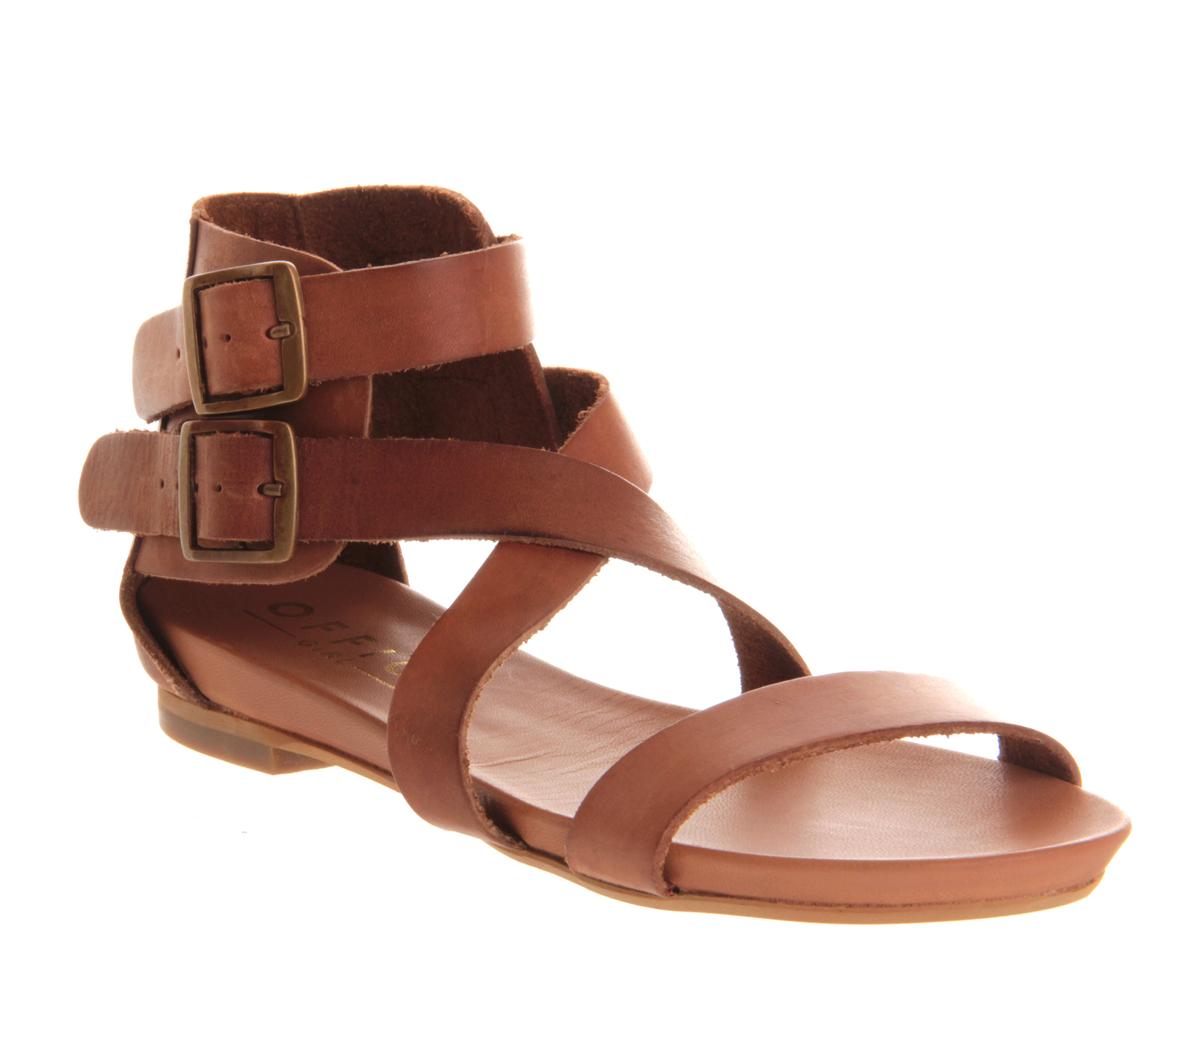 Wonderful Handmade Dark Brown Flat Sandals For Women Real Italian Leather | Gianluca - The Leather Craftsman